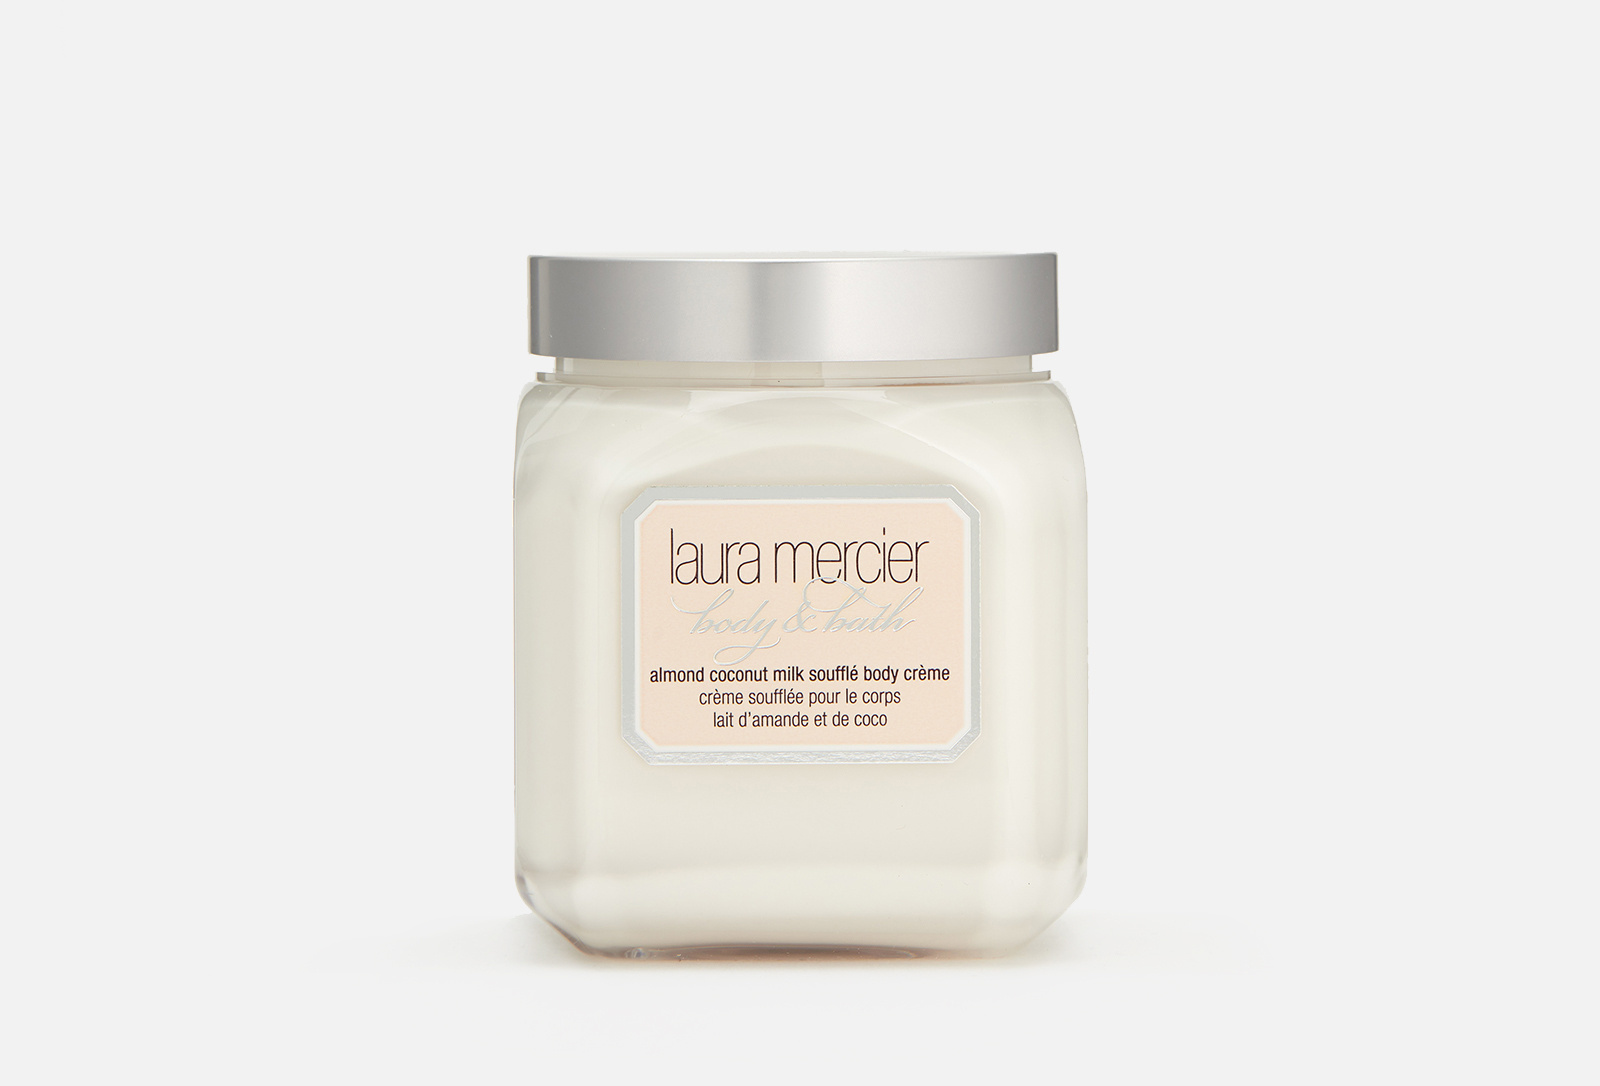 Крем для тела Laura Mercier Almond Coconut Body Cream 300 мл